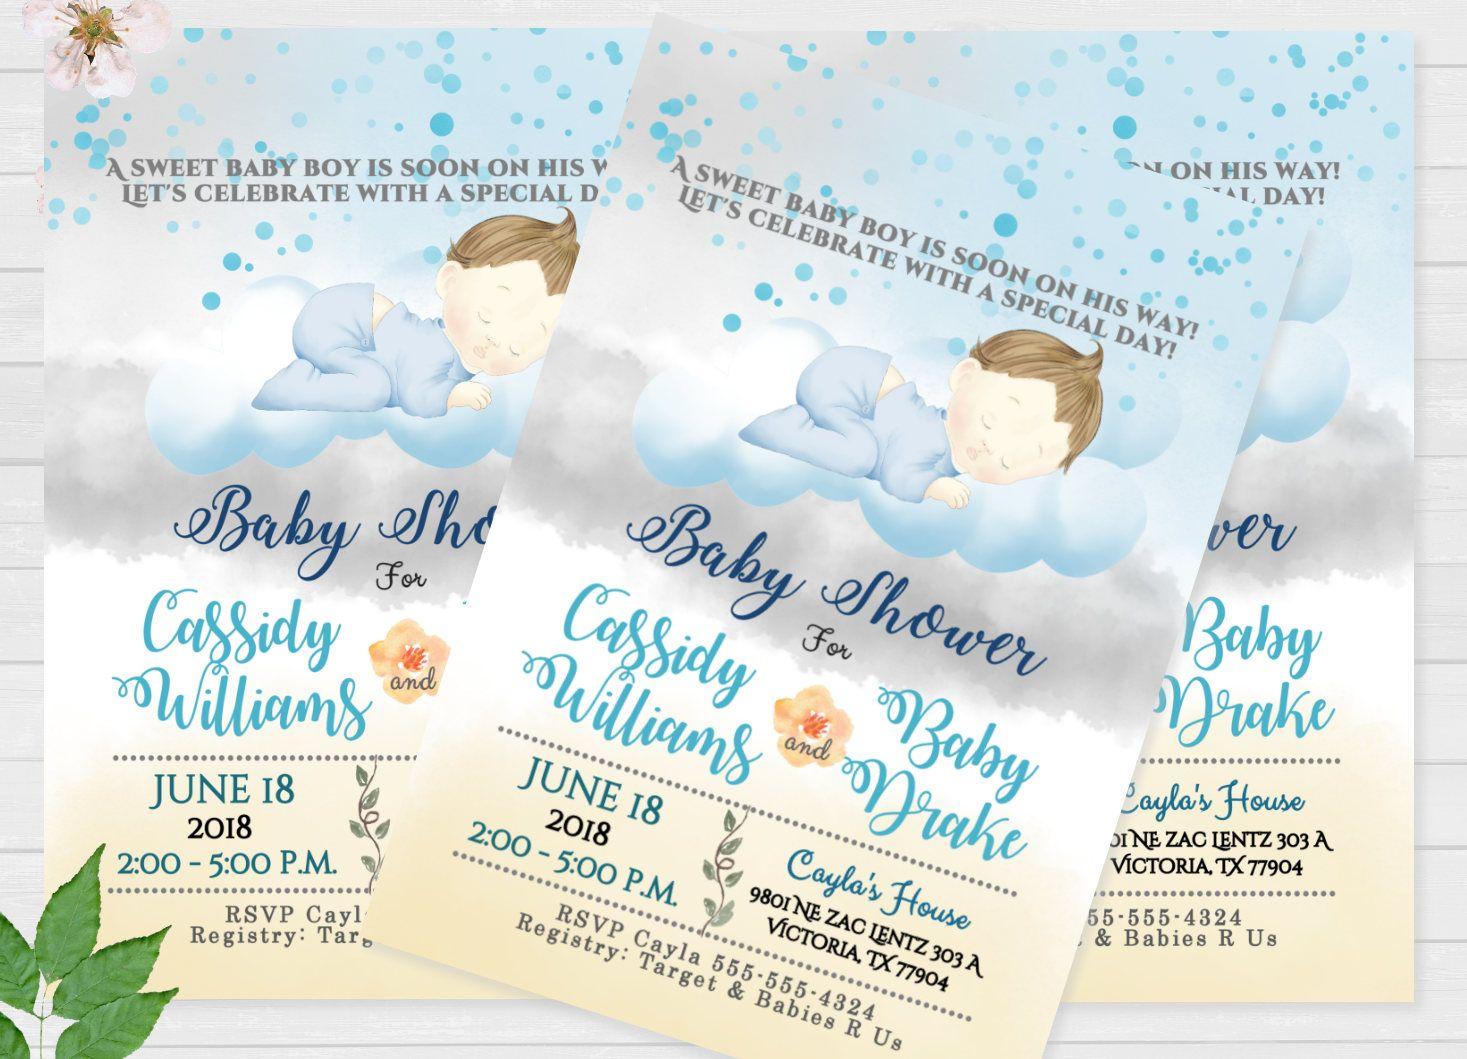 Baby Boy Shower Invitations Baby Shower Sleeping Baby Shower ...